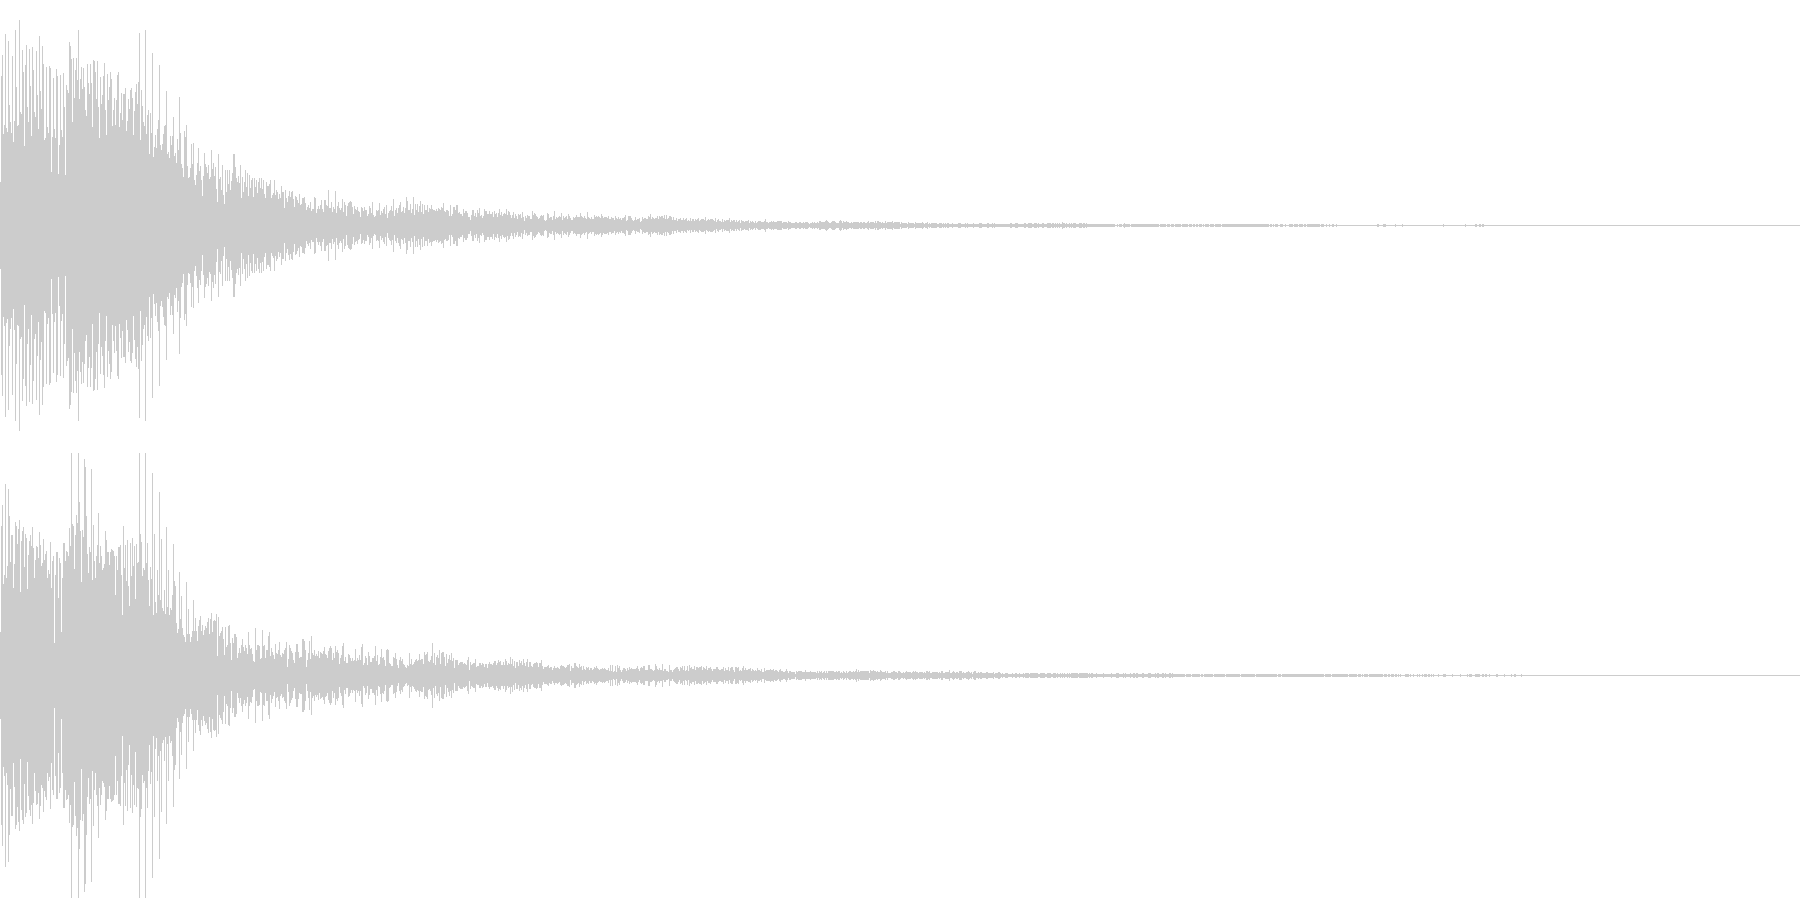 Moog ファットなコマンド音 2の未再生の波形